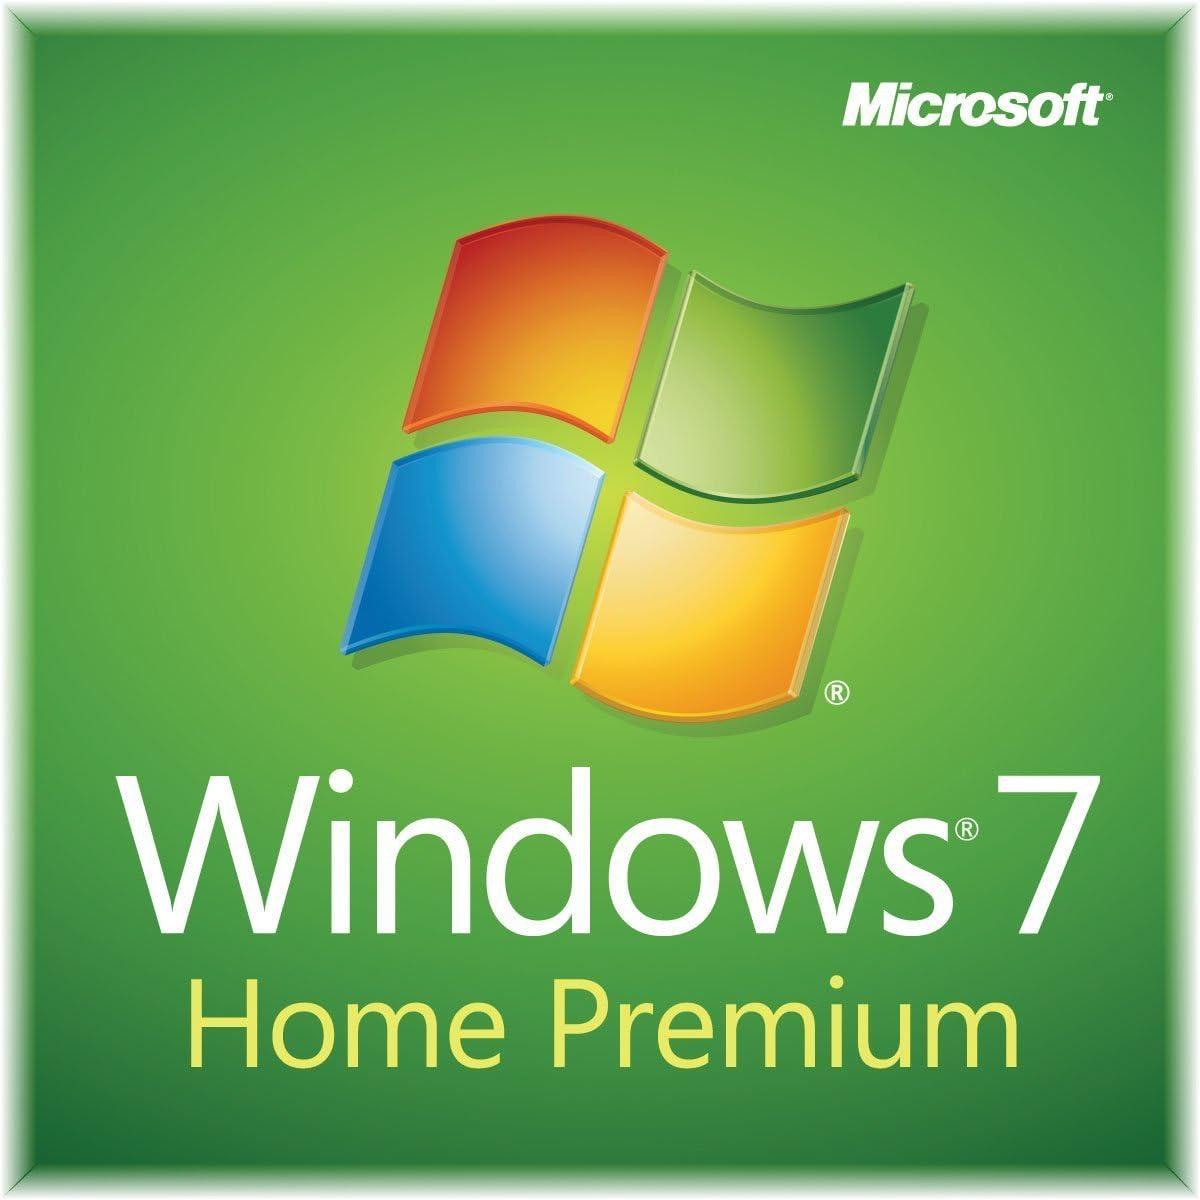 Windows 7 Home Premium SP1 32bit (OEM) System Builder DVD 1 Pack (For Renewed PC Installation)